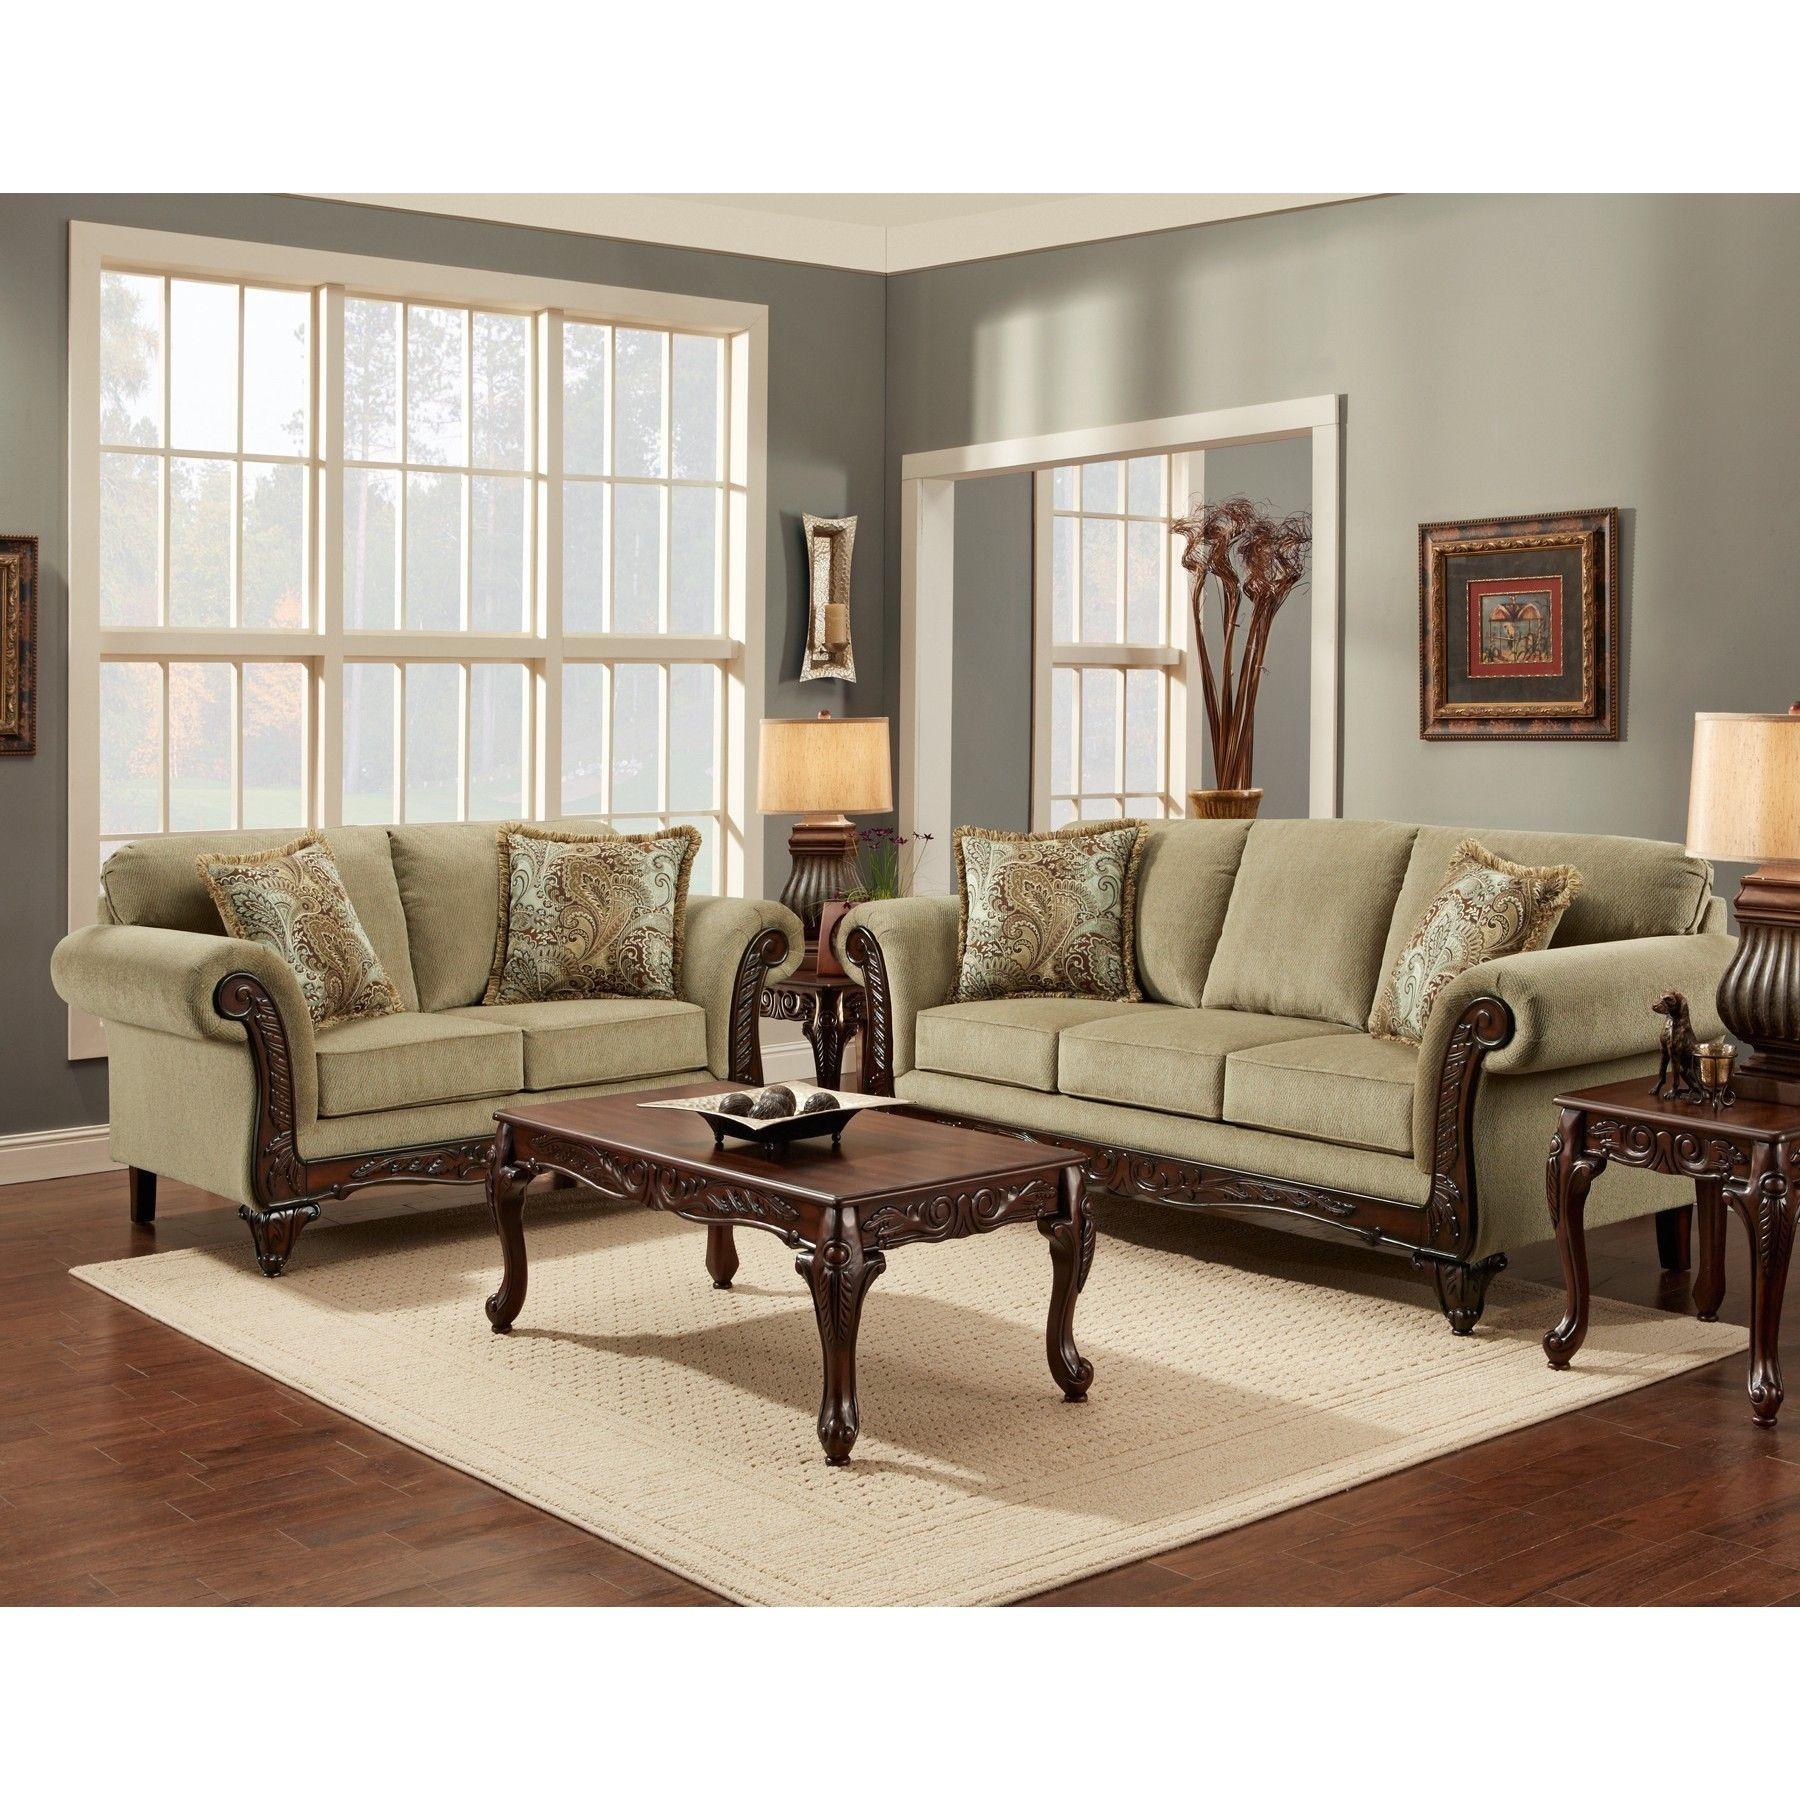 Sofa Trendz Chasity Platinum 5 Piece Living Room Sofa Set